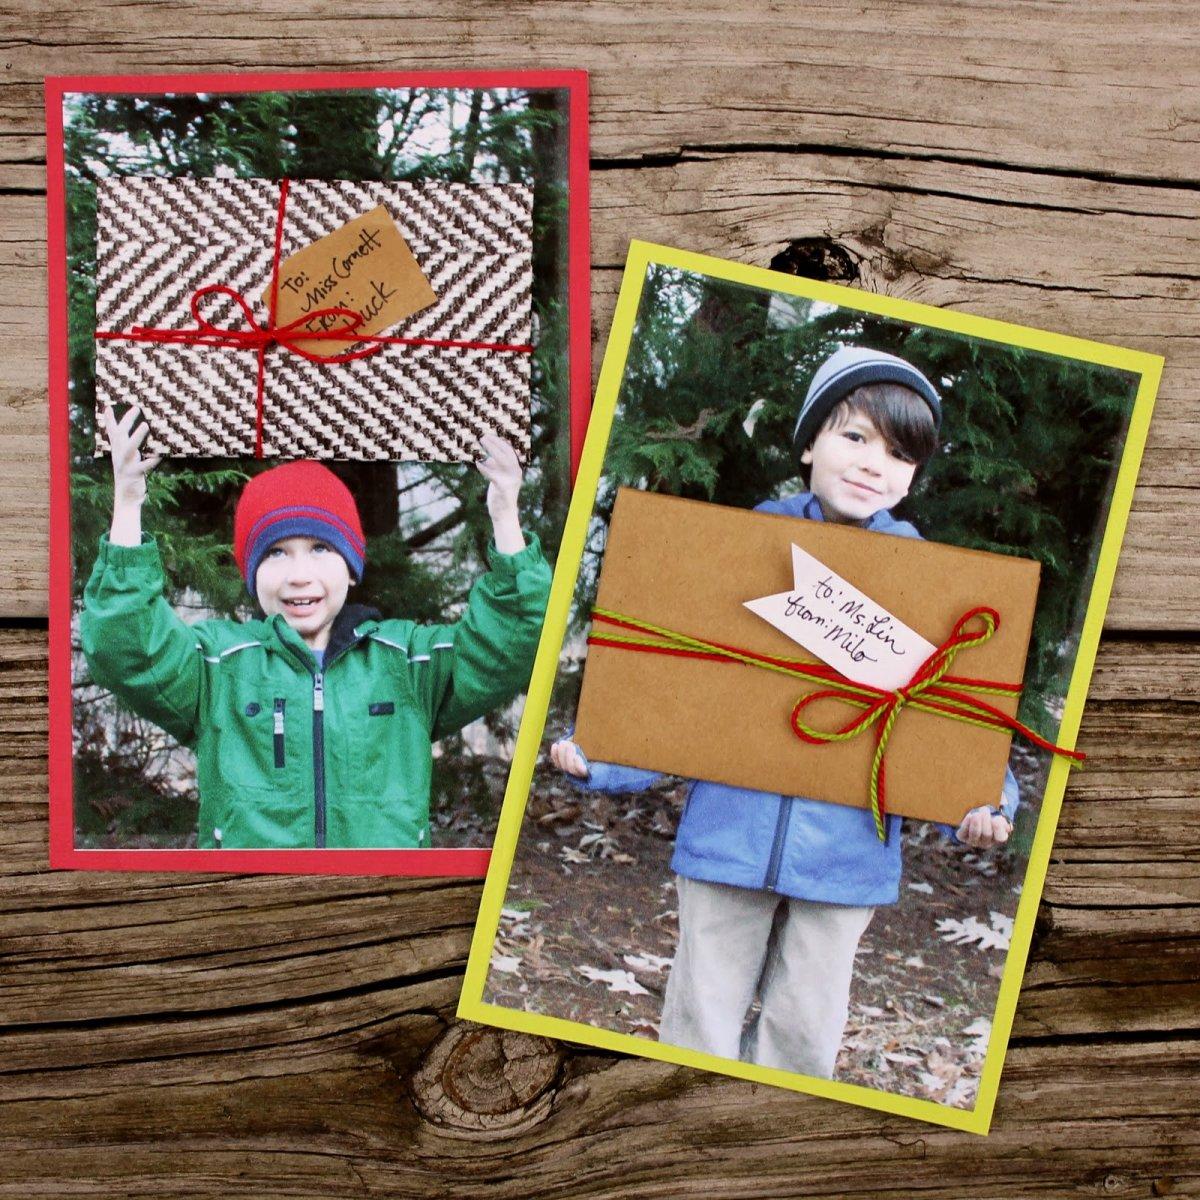 Creative idea for presenting a gift card to a teacher.